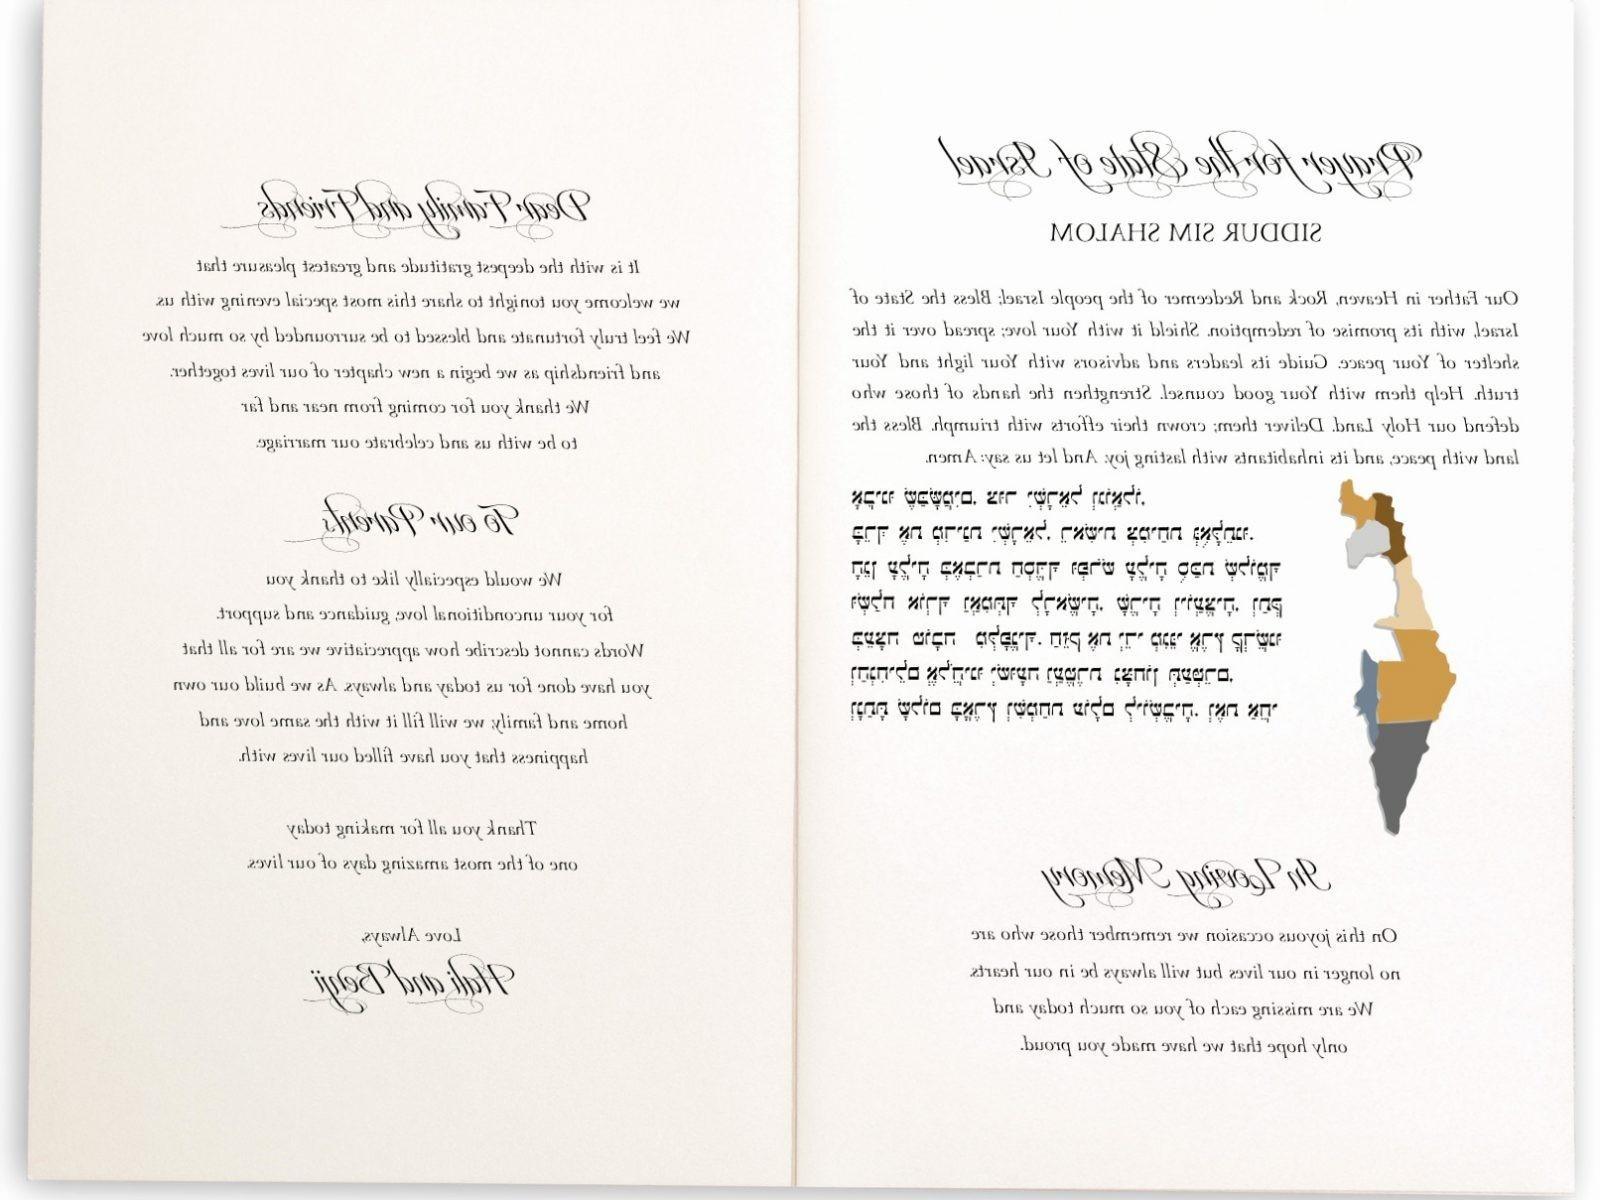 Free Printable Wedding Invitation Templates For Word Free Printable - Free Printable Wedding Invitation Templates For Word